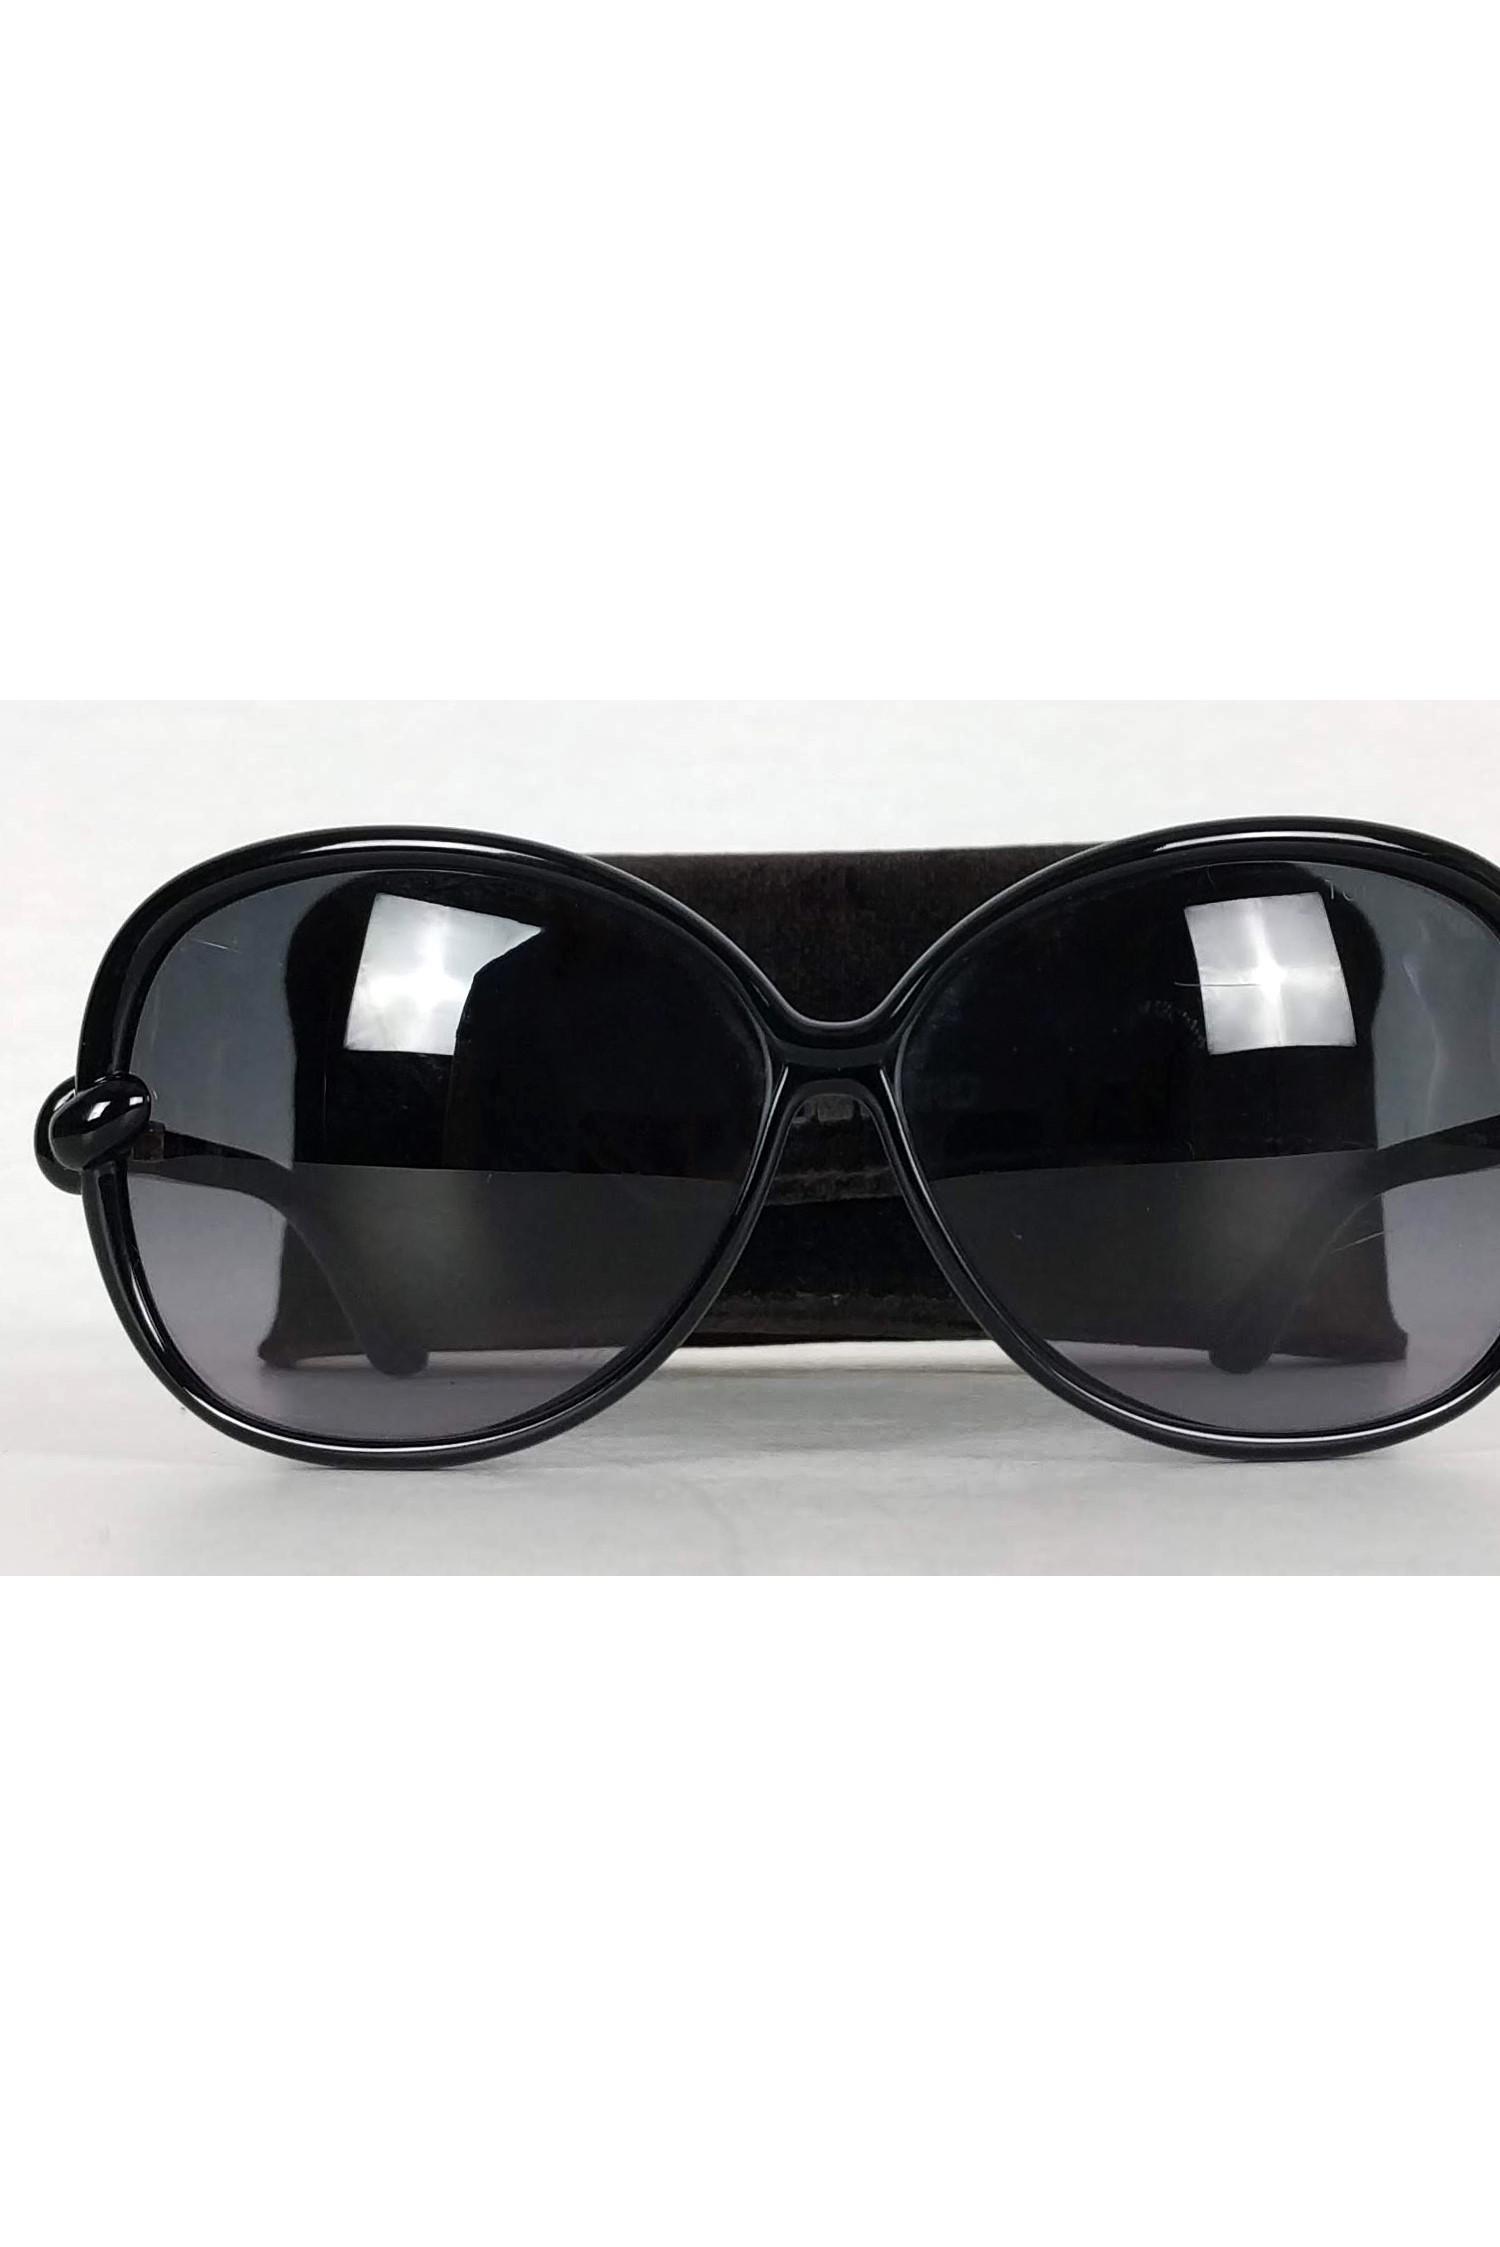 fb55eb8c62 Tom Ford - Black Ingrid Sunglasses - Lyst. View fullscreen